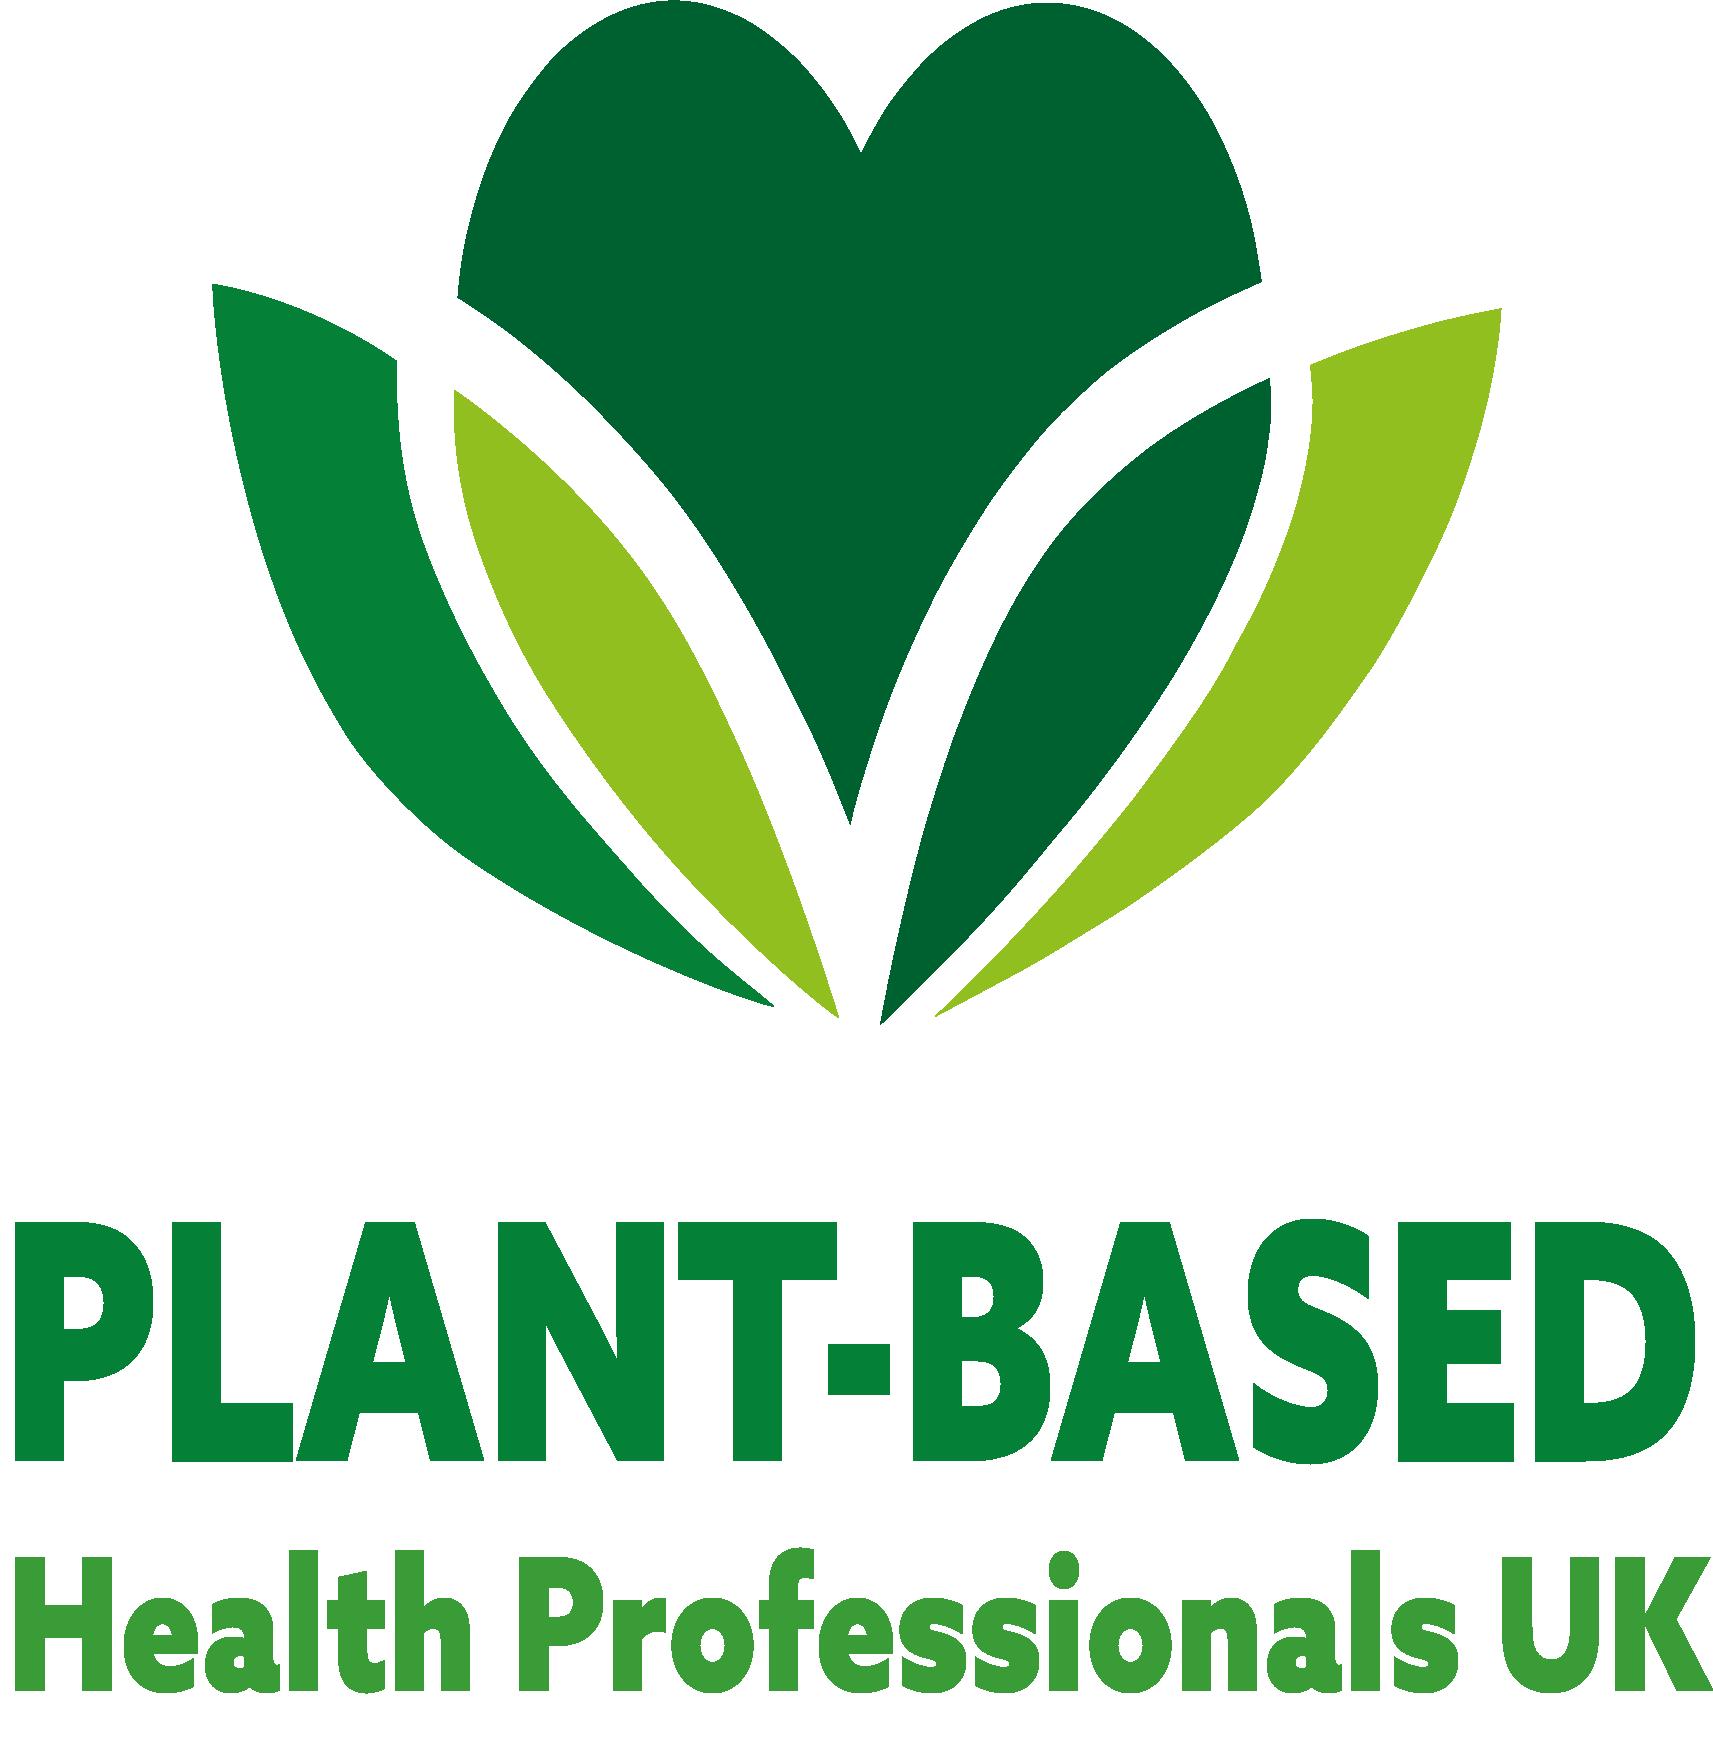 Plant-Based Health Professionals UK